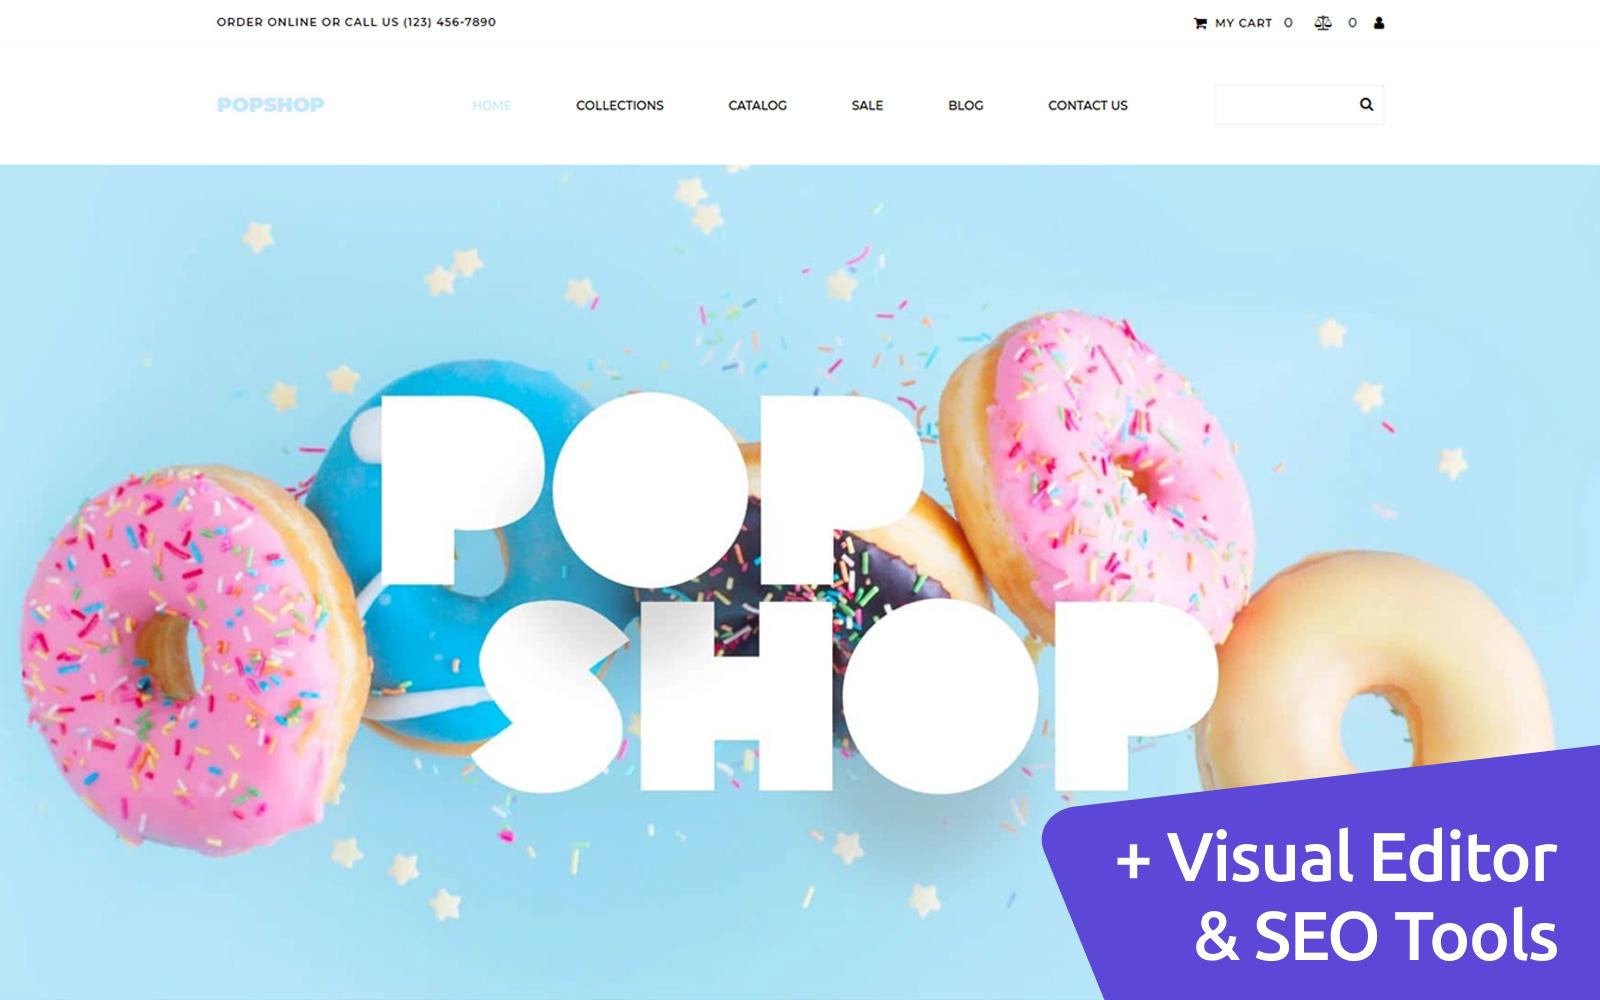 Responsivt Popshop - Sweet Shop MotoCMS Ecommerce-mall #102547